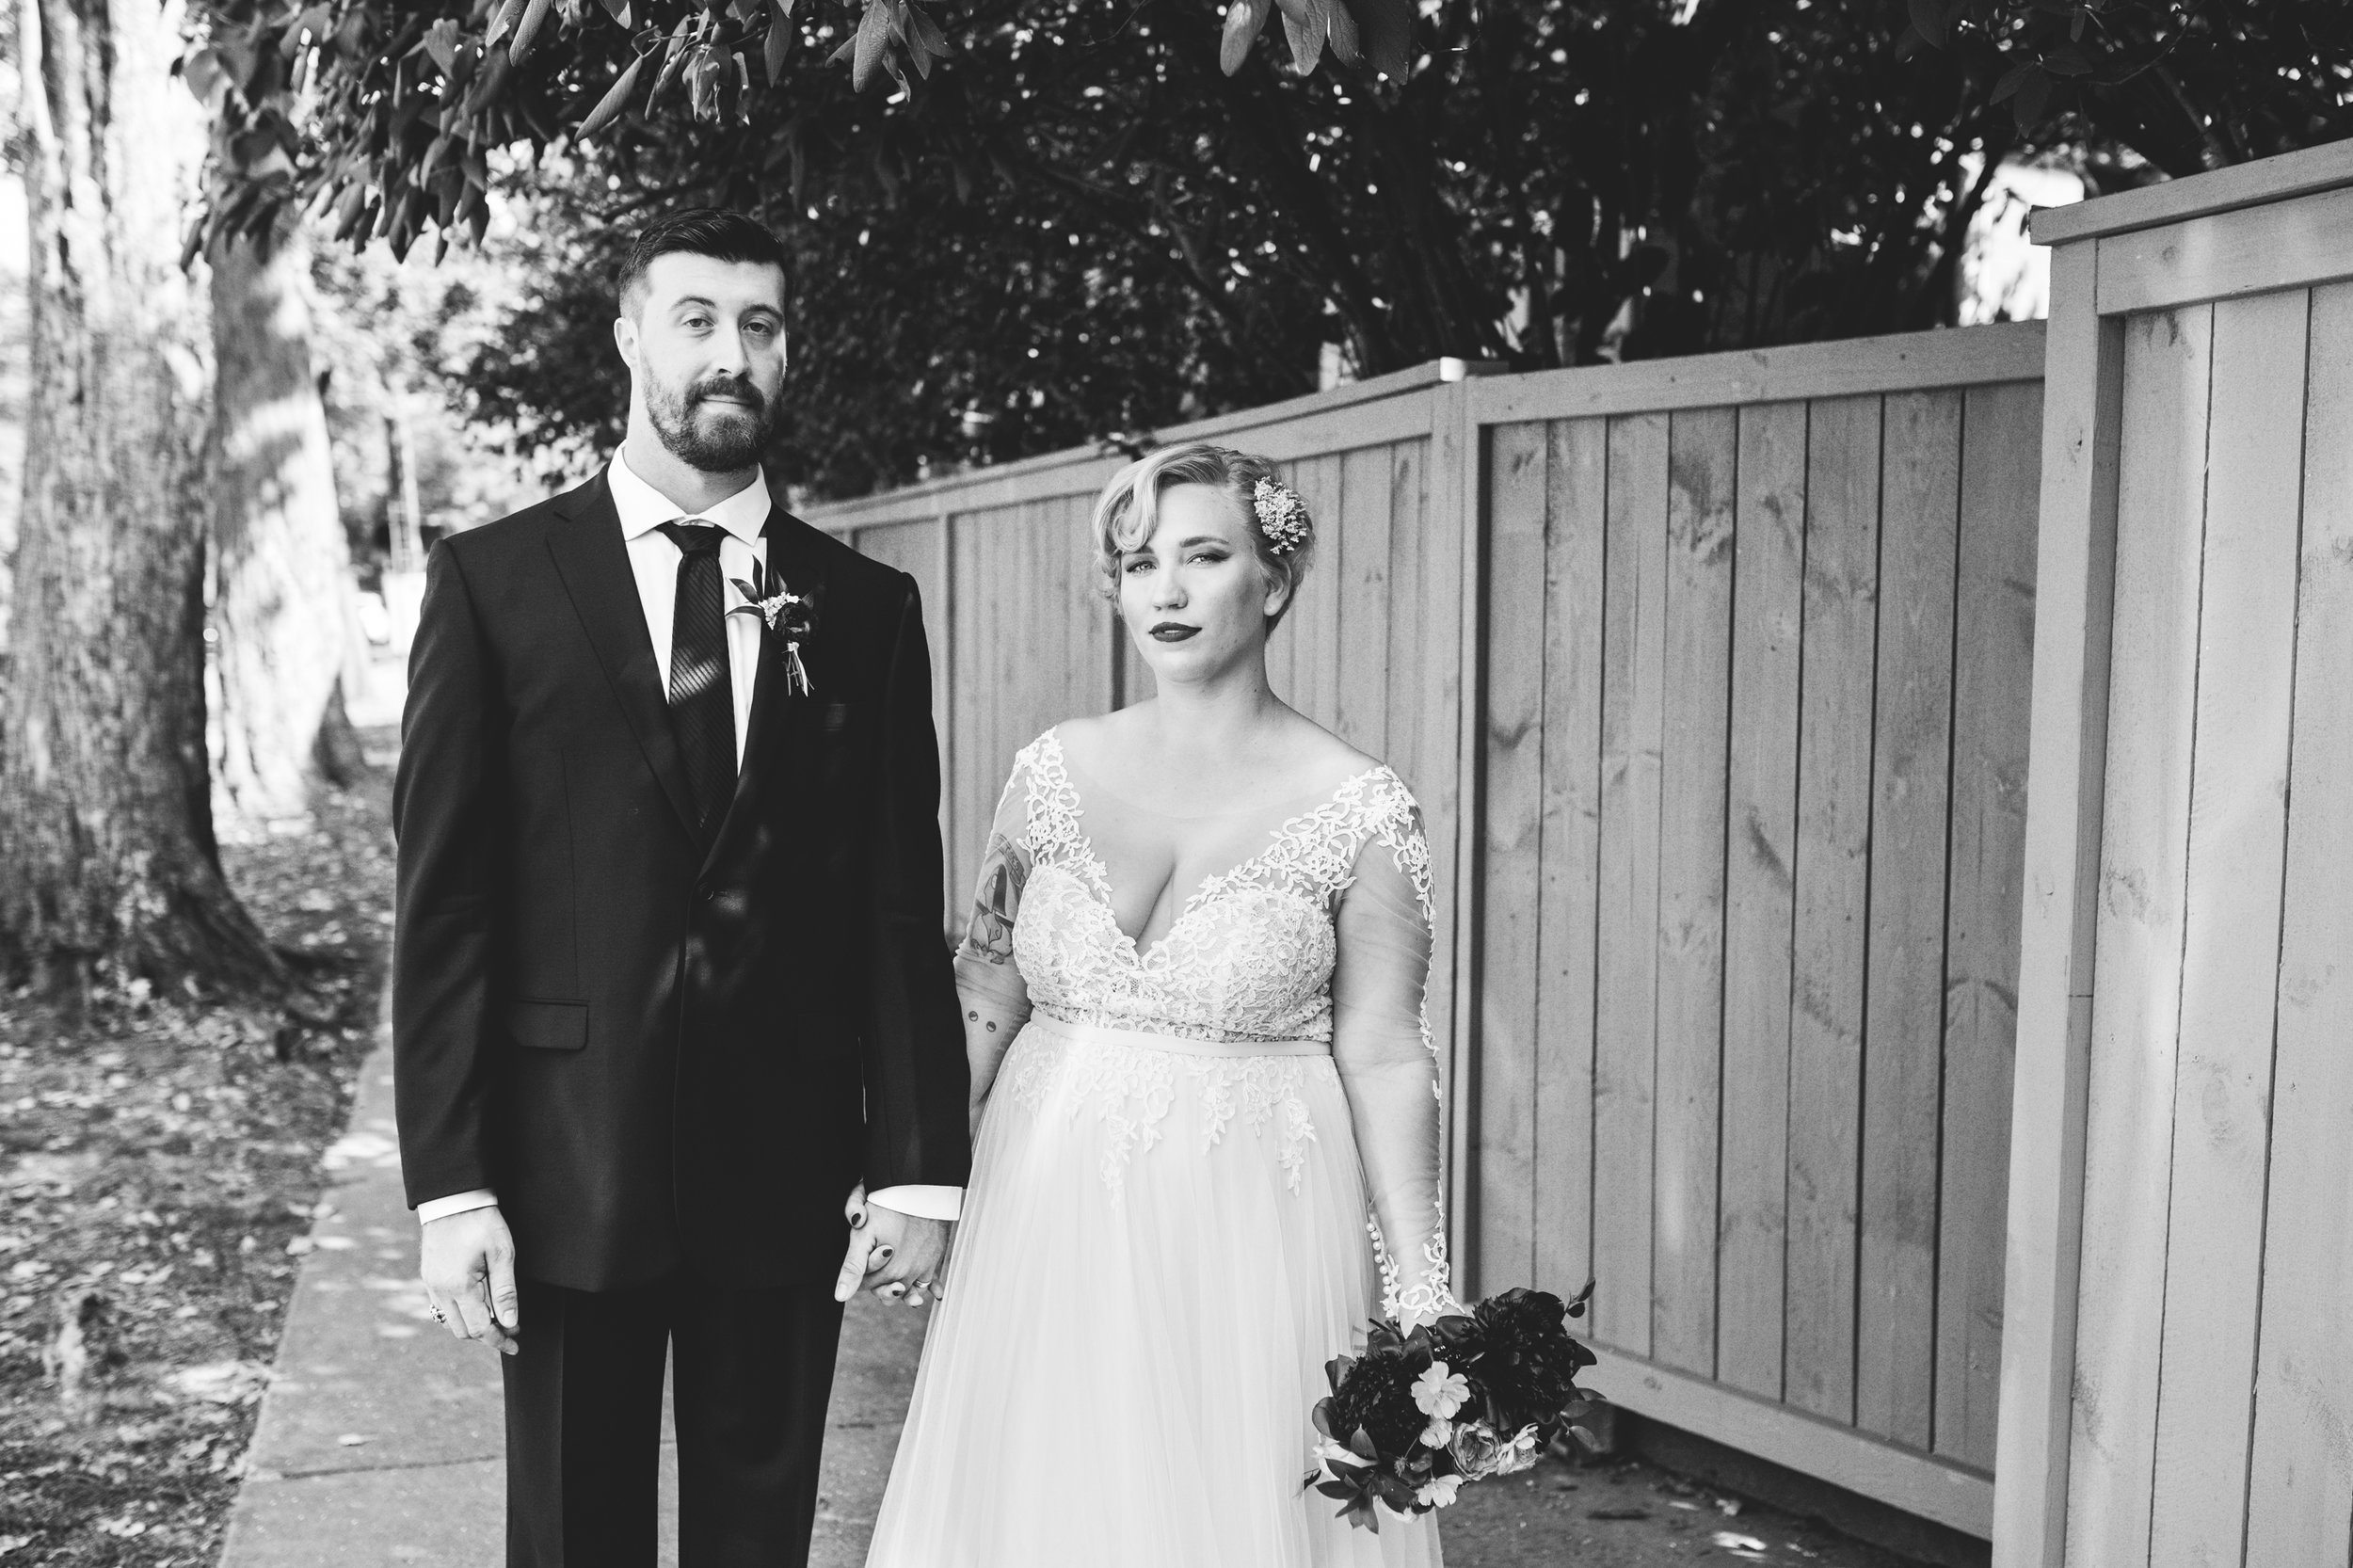 Kentucky Wedding Louisville Wedding Photographer 2018 Crystal Ludwick Photo Louisville Wedding Photographer Kentucky Wedding Photographer (101 of 105).jpg